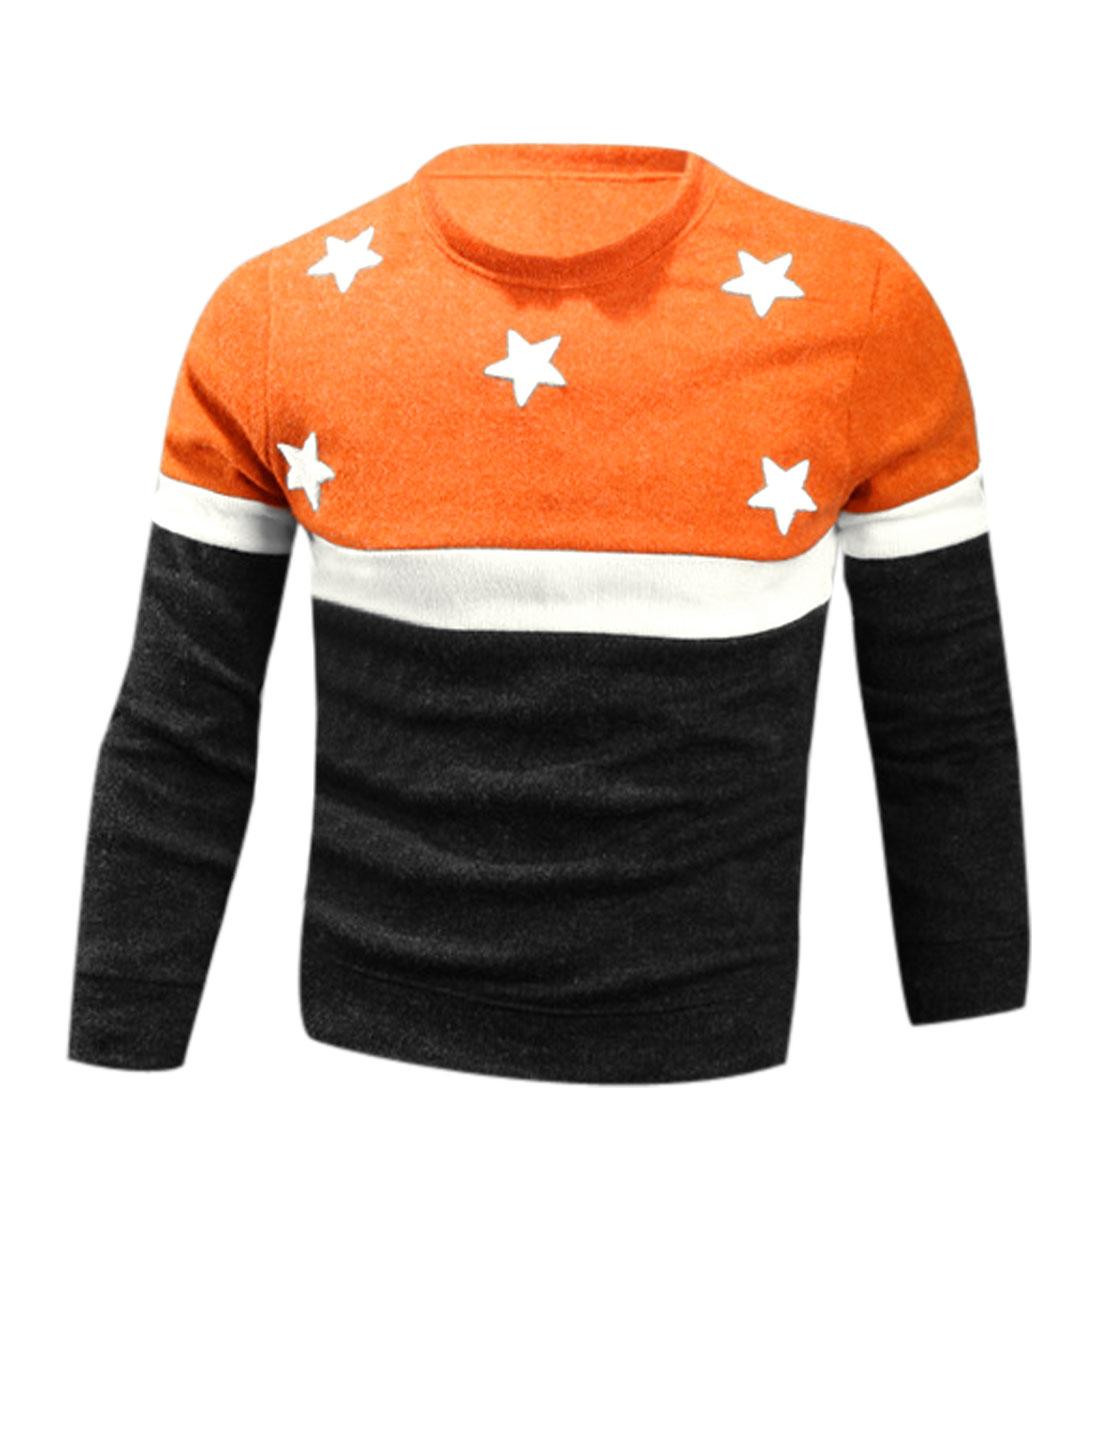 Men Charcoal Orange Round Neck Stars Applique Color Bock Full Sleeves Knit Shirt M